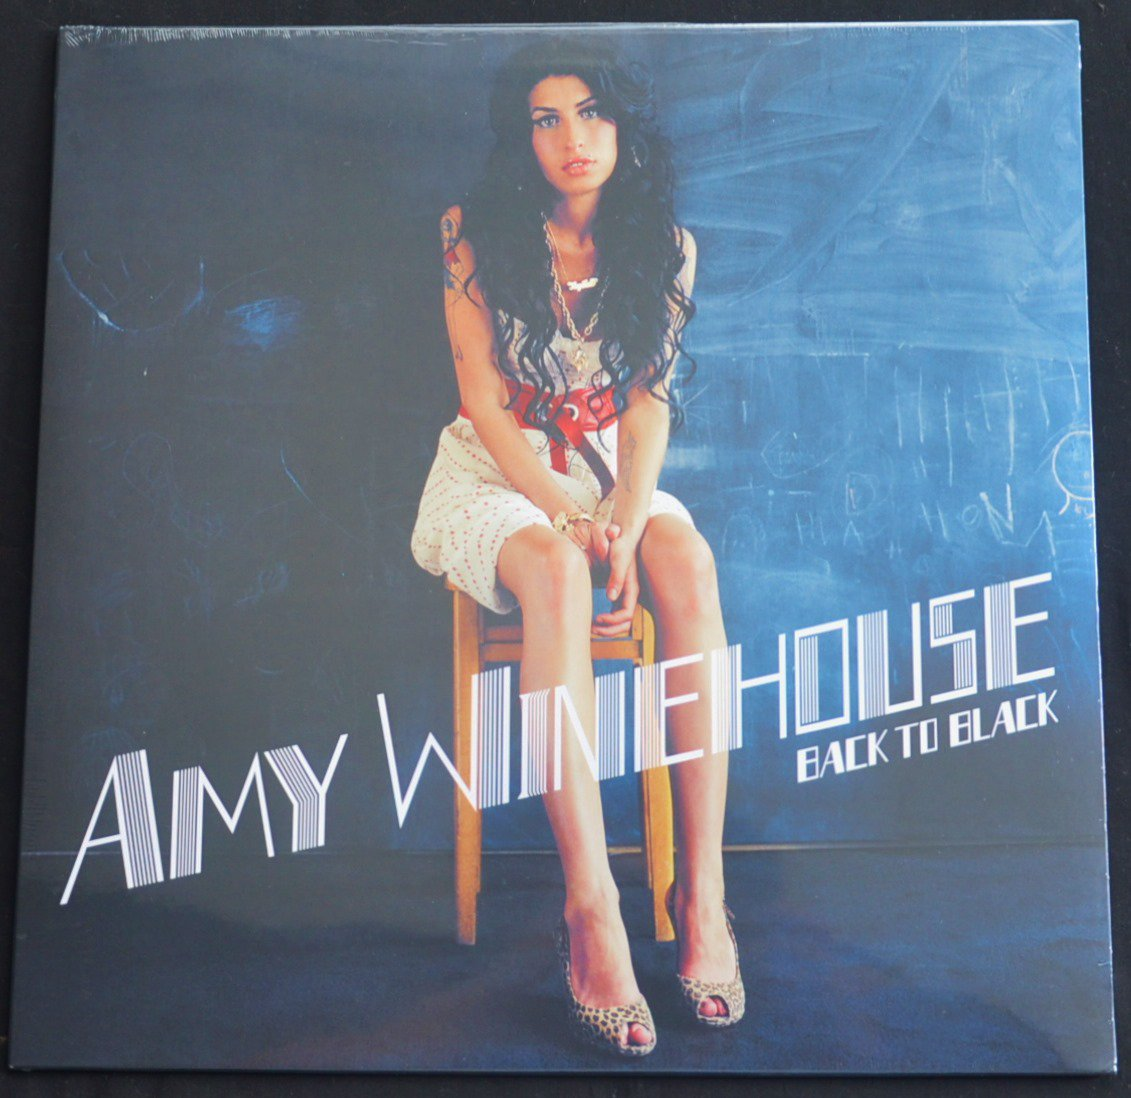 AMY WINEHOUSE / BACK TO BLACK (1LP)